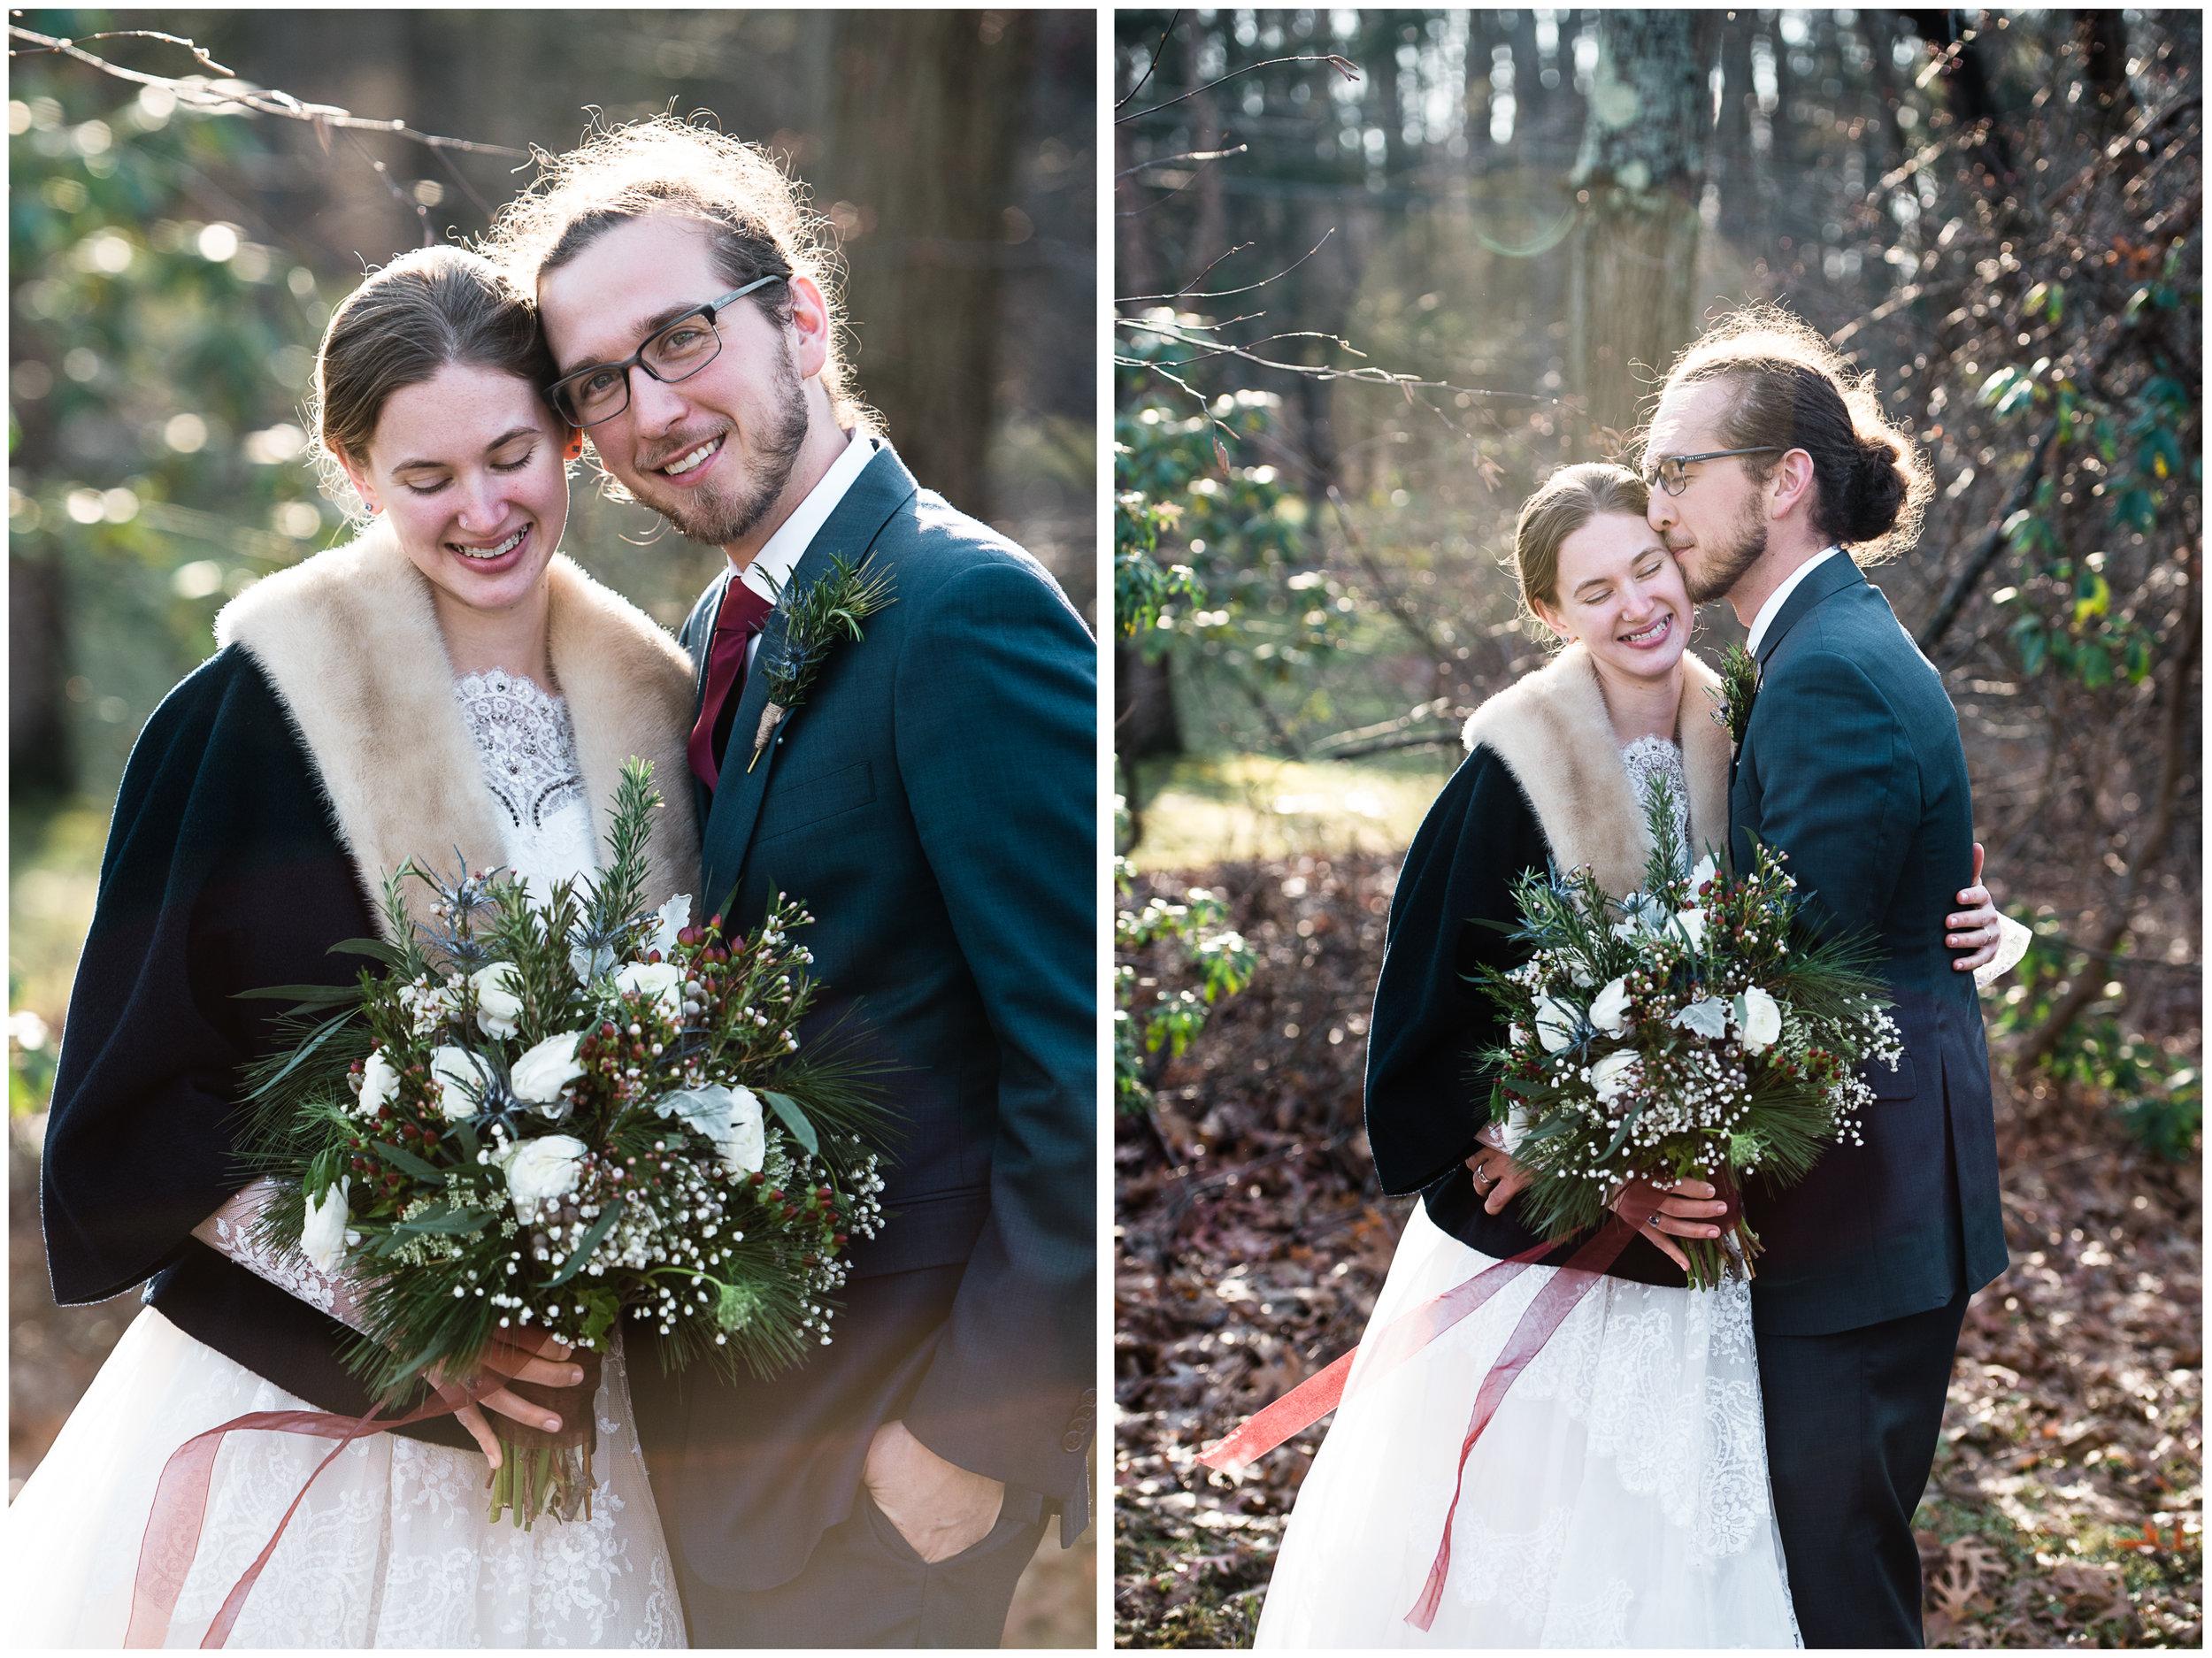 Bridal Portraits, Mariah Fisher Photography, Ligonier wedding photographer.jpg